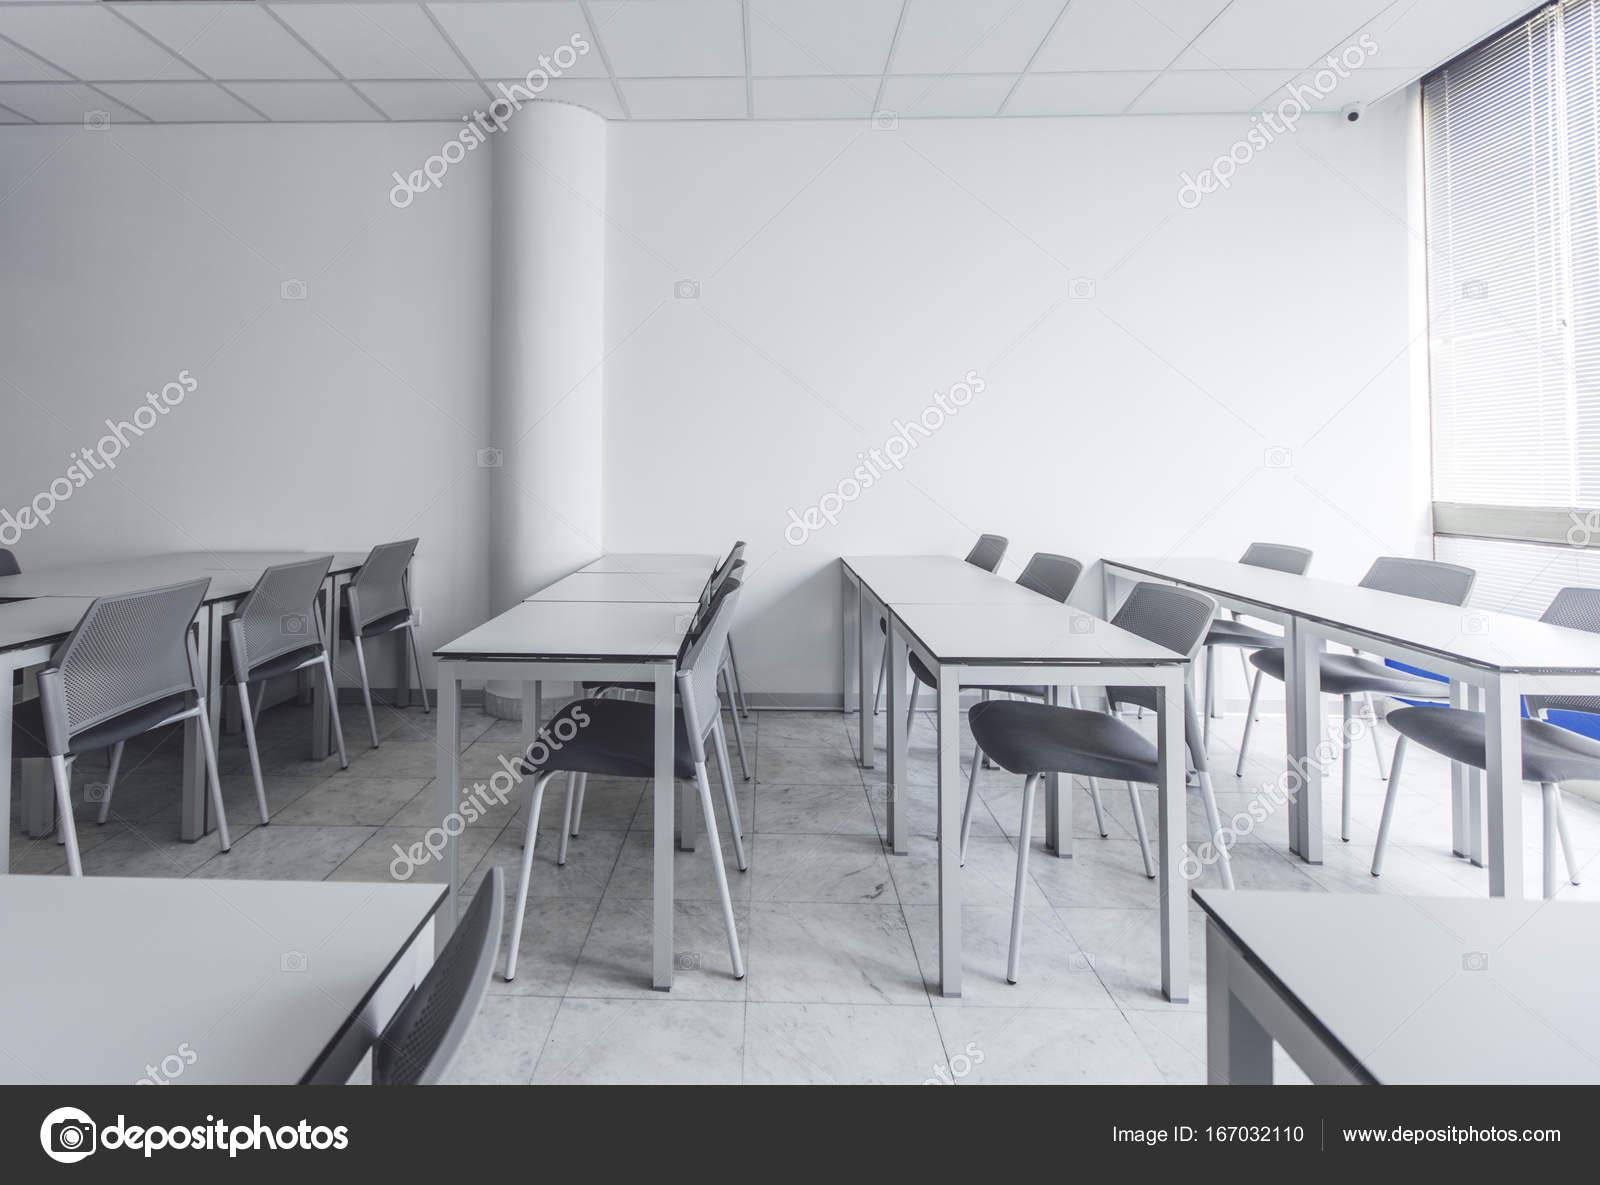 Modern High School Classroom : School design studio provide studios to support project based